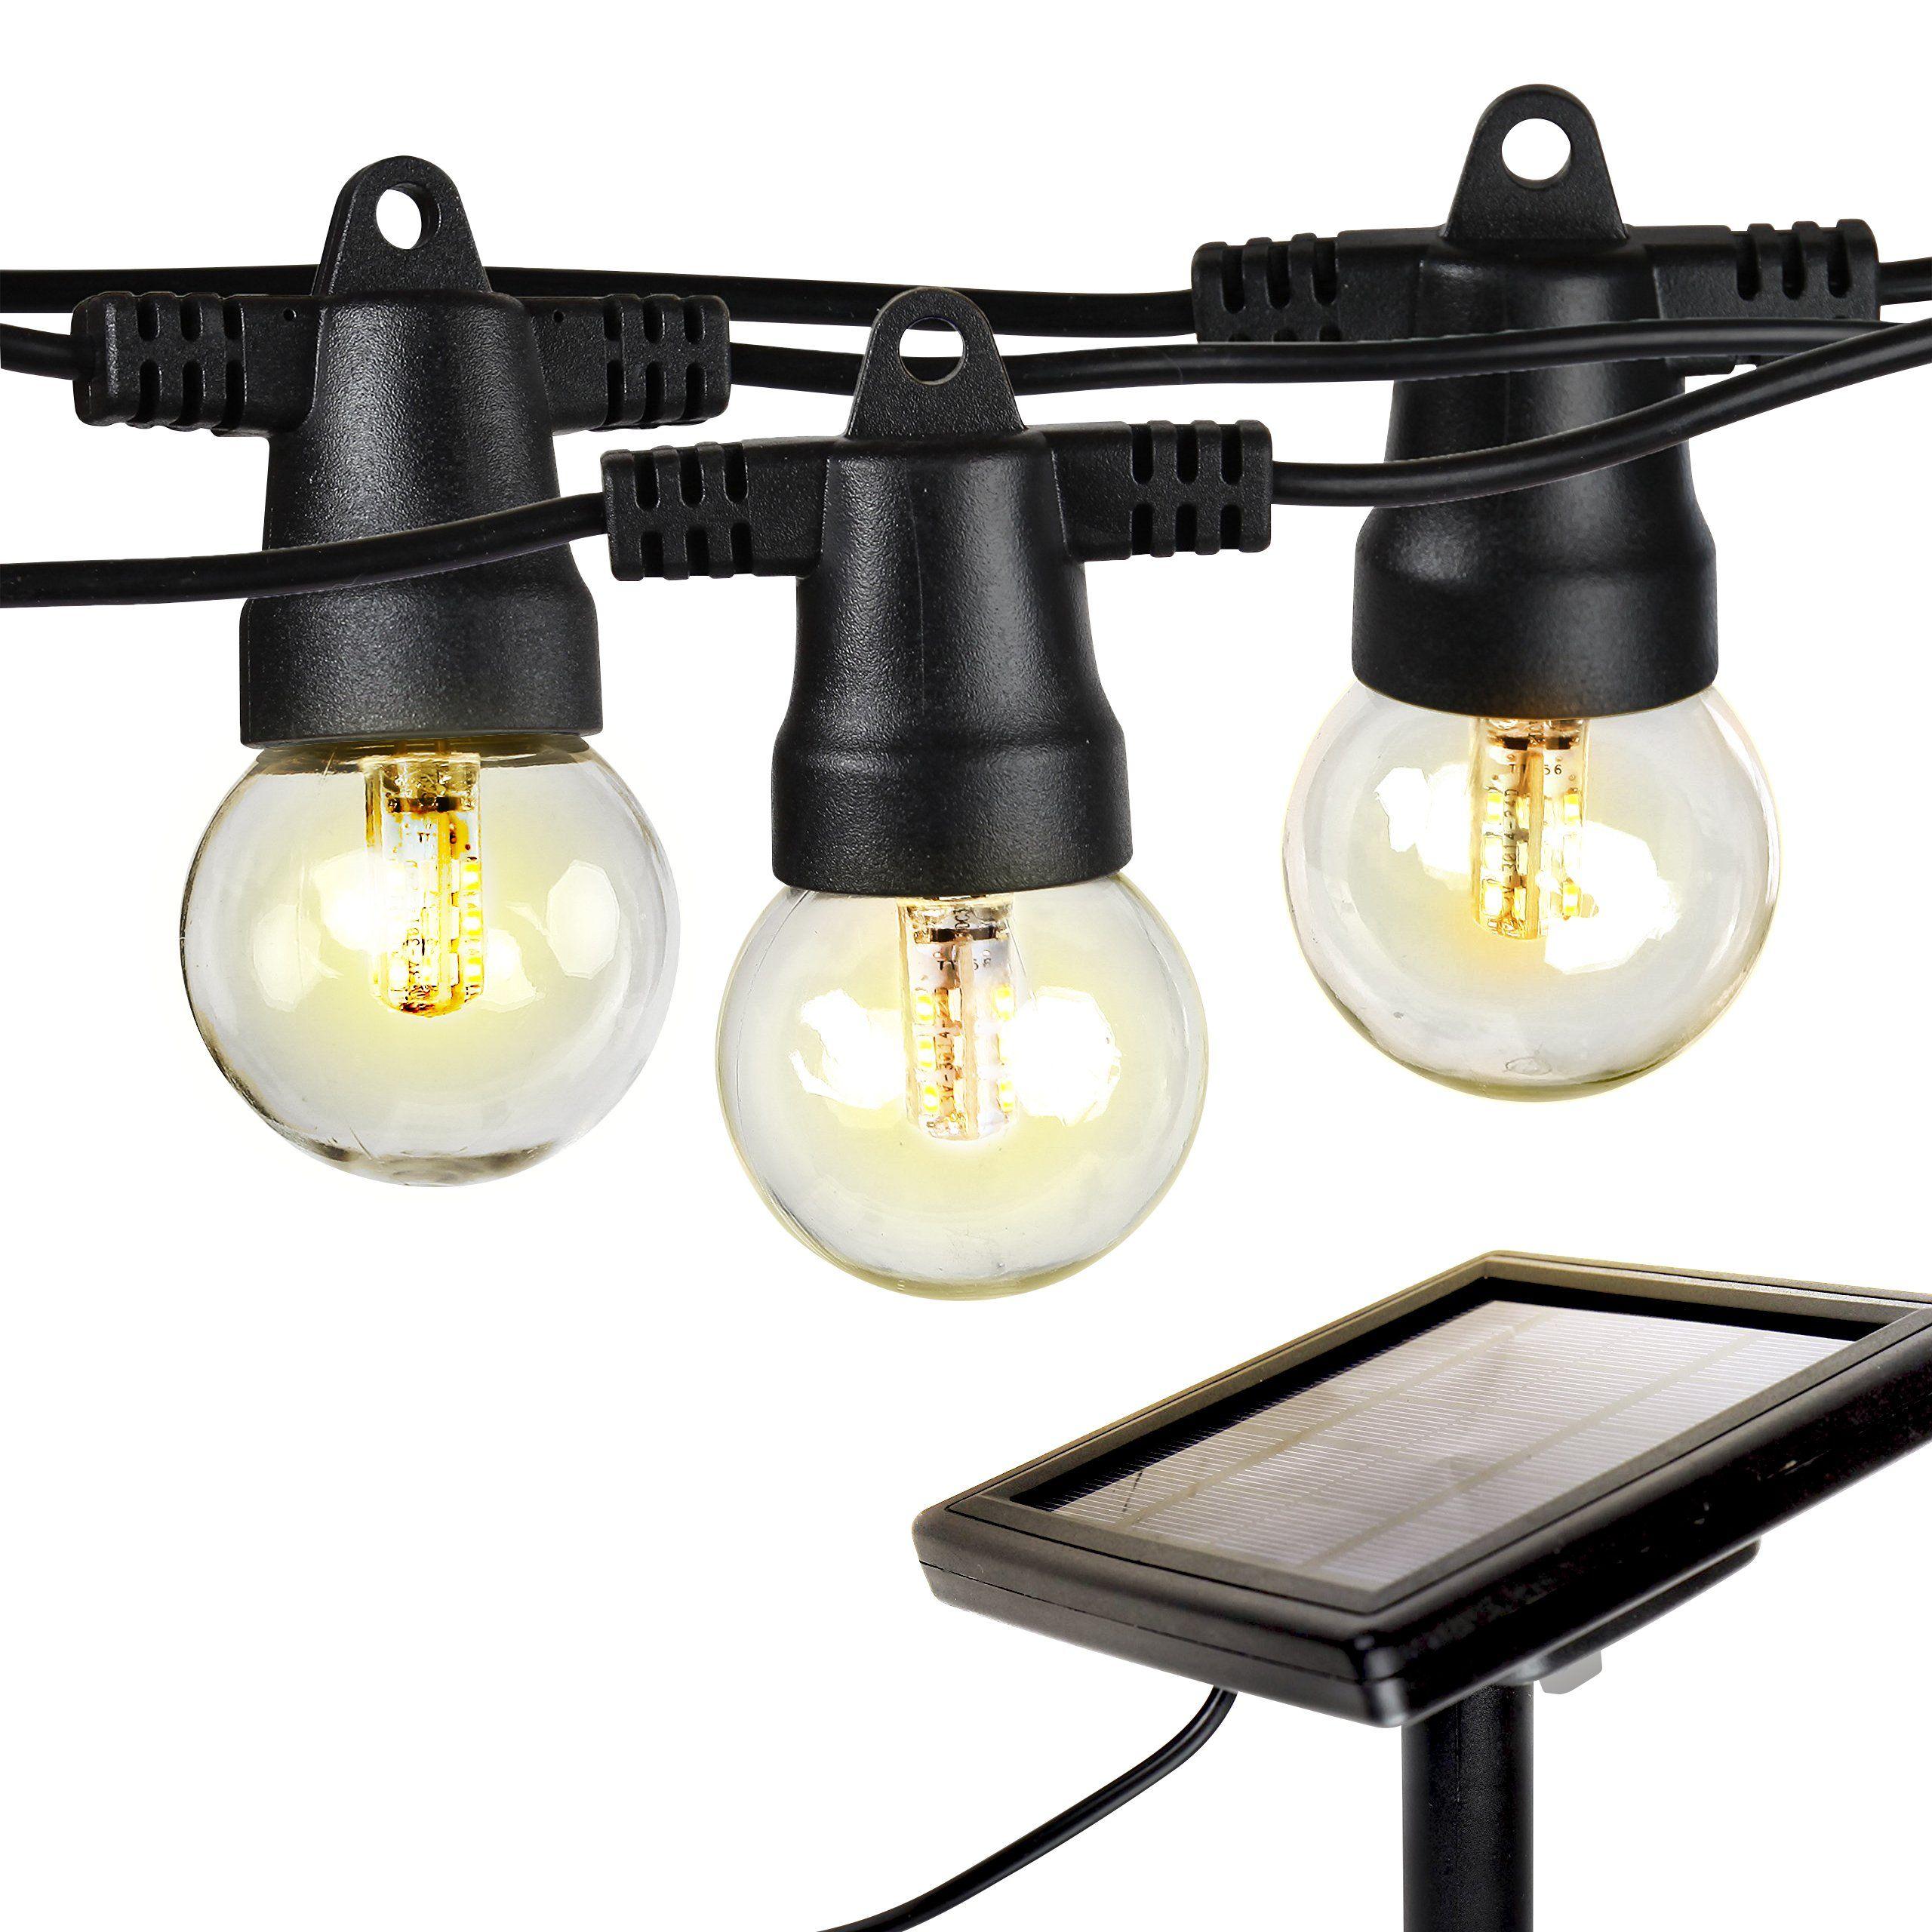 outdoor string backyard decorative tar diy pole led light talentneeds pics for lights of elegant lighting com